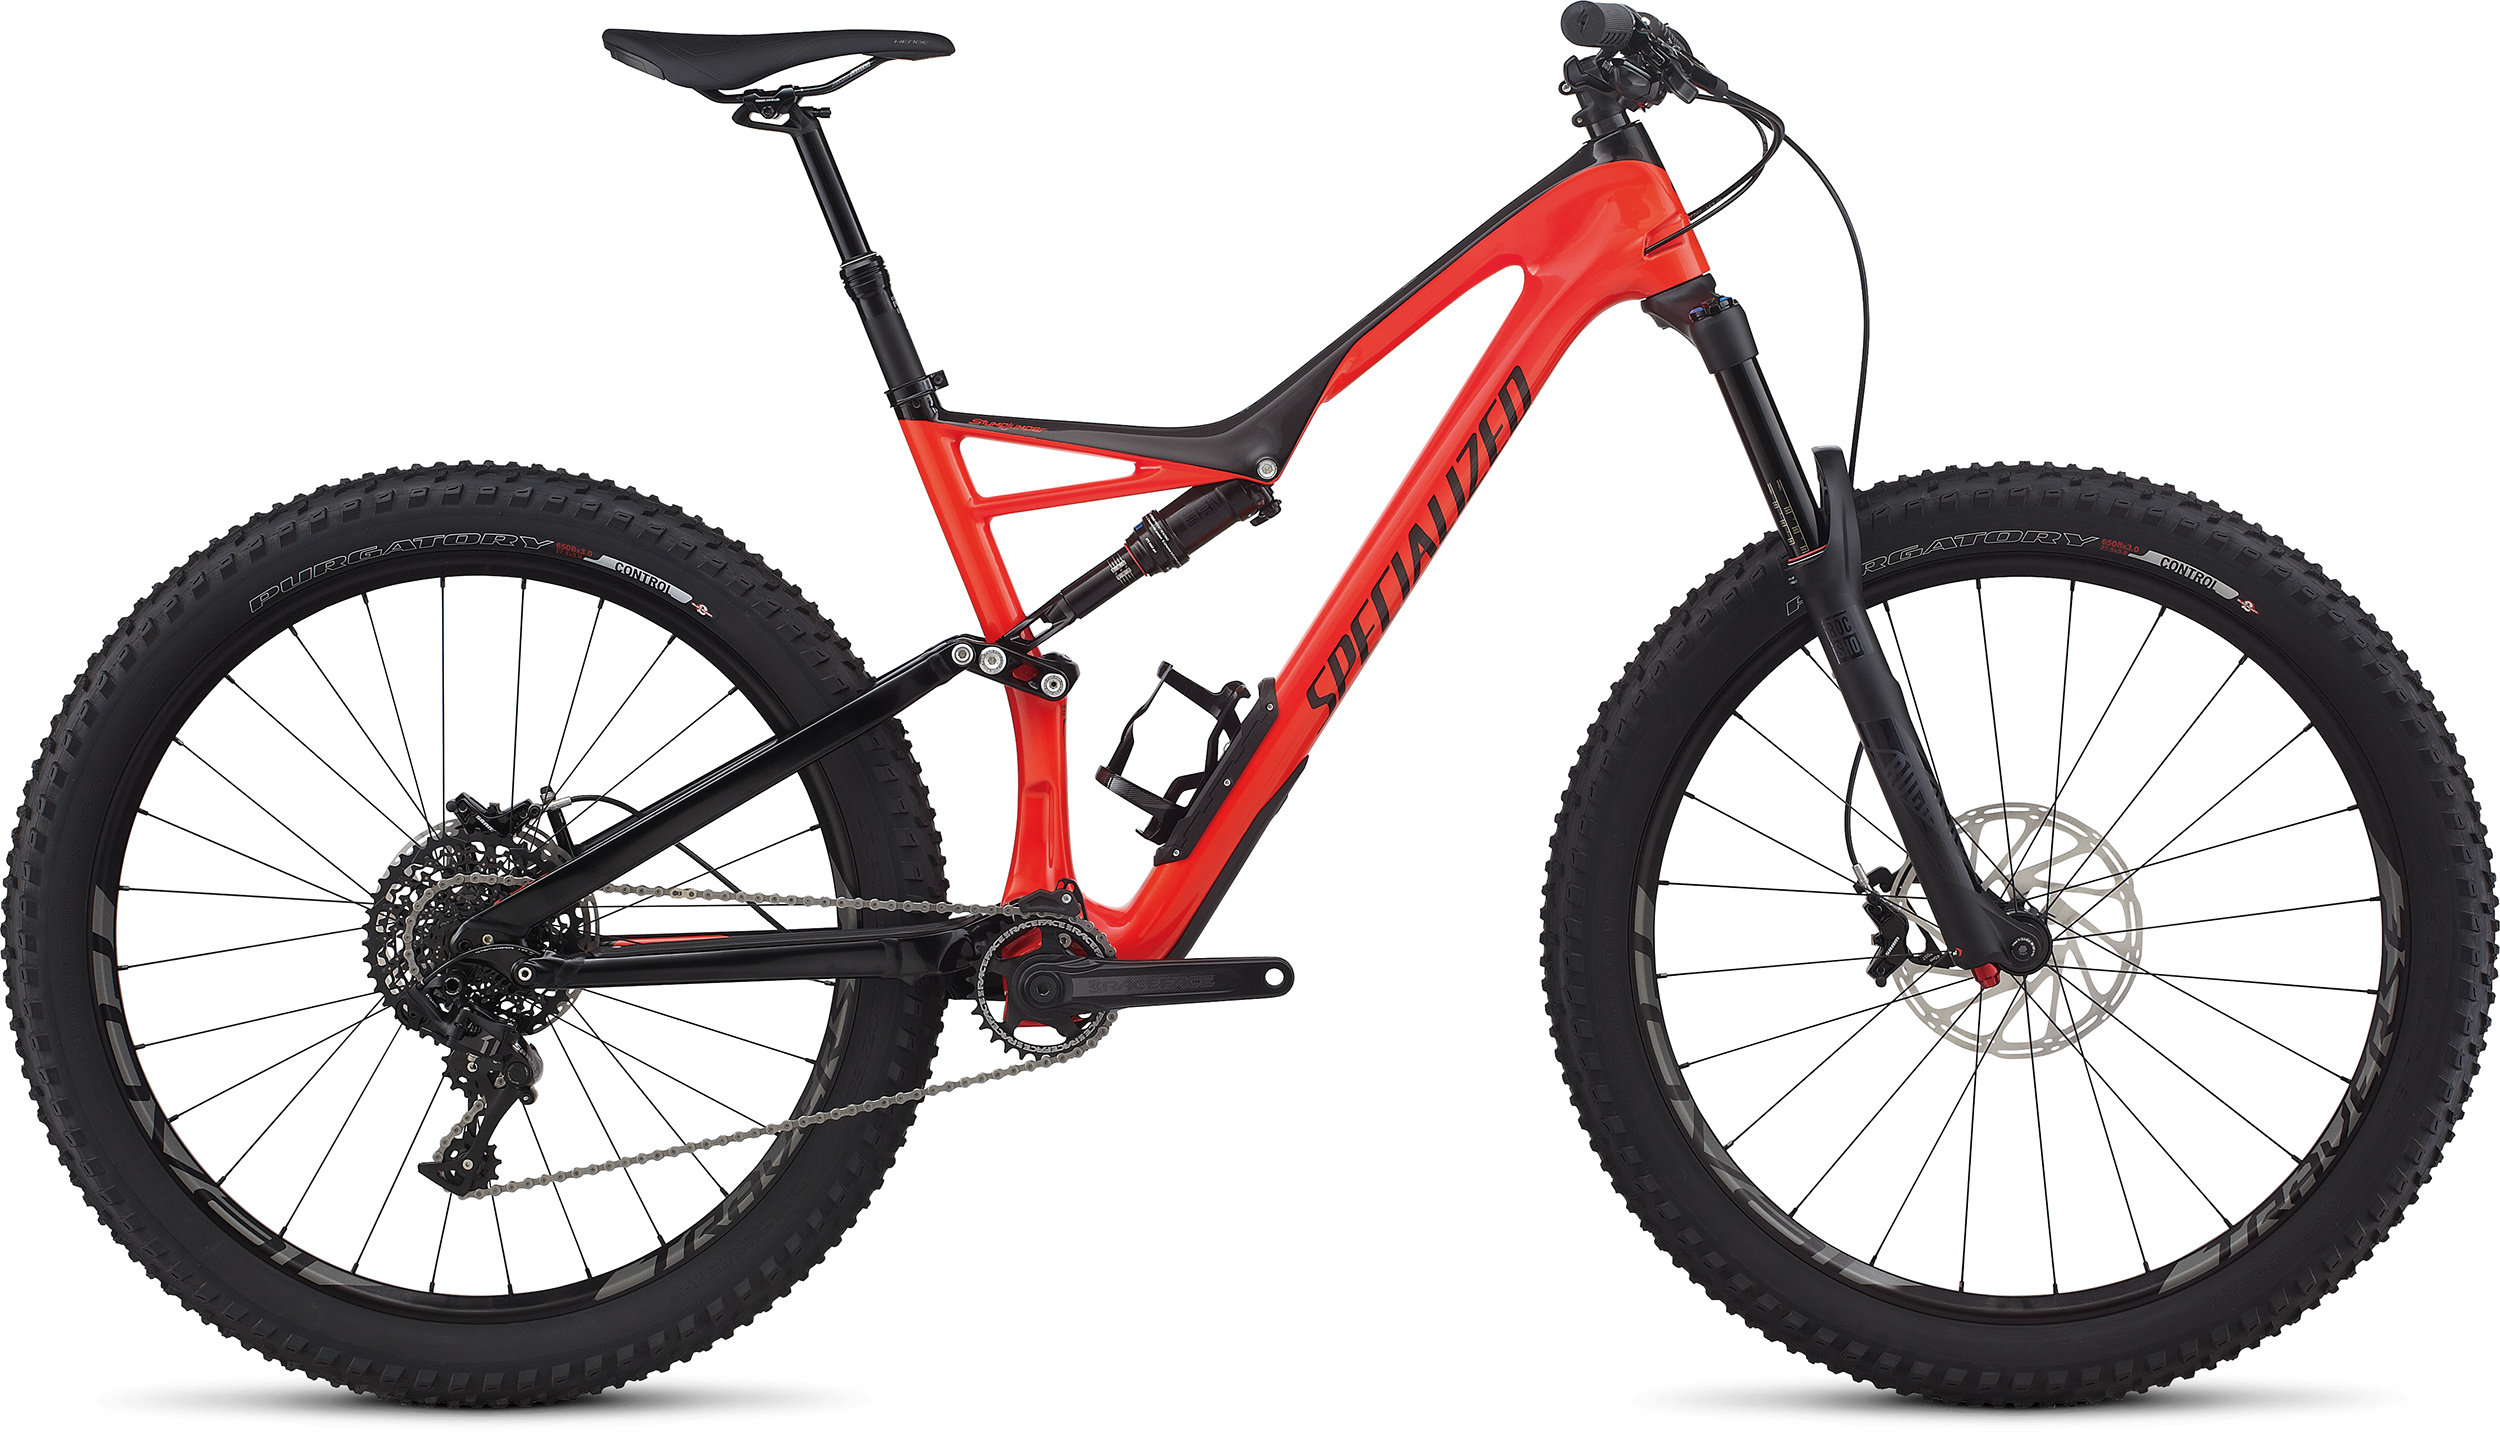 SPECIALIZED SJ FSR EXPERT CARBON 6FATTIE RKTRED/BLK L - Pulsschlag Bike+Sport